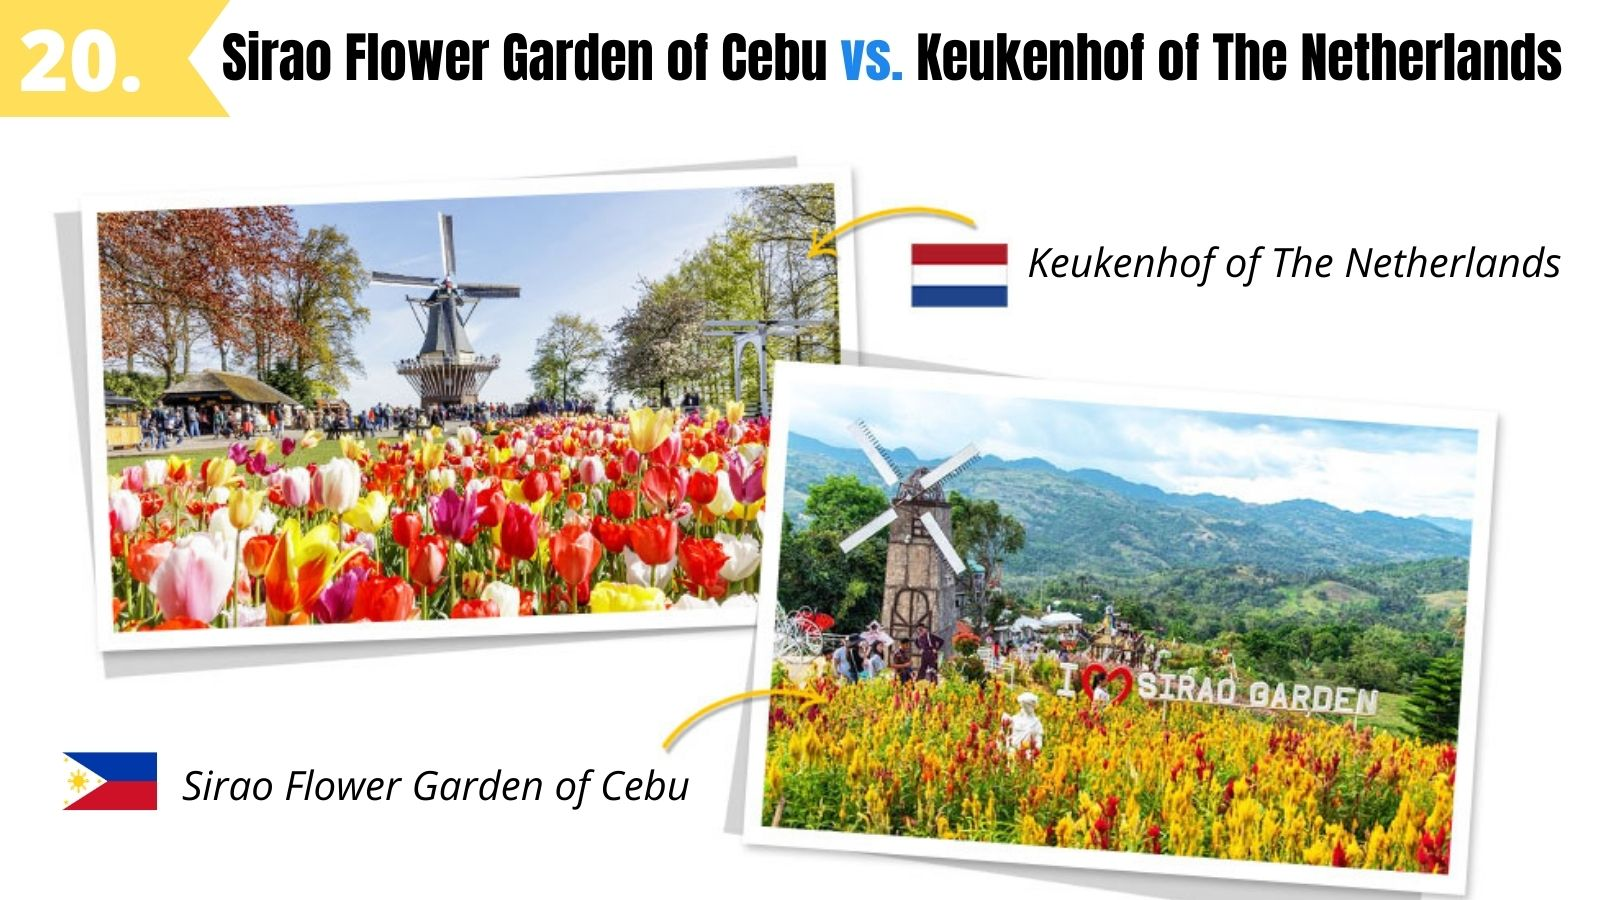 sirao flower garden mini amsterdam of cebu